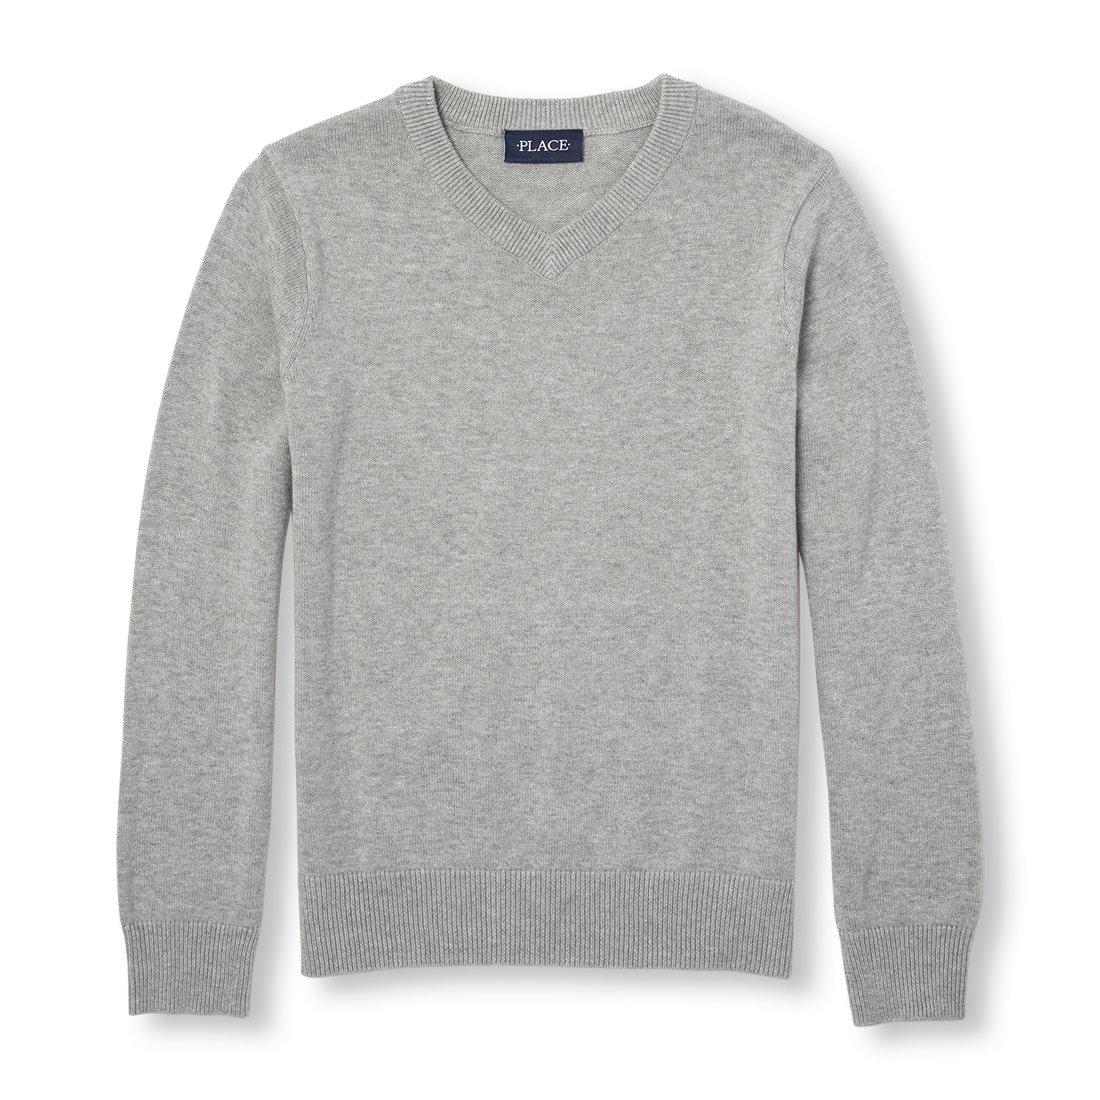 The Children's Place Big Boys' Long Sleeve Sweater, SMOKEB10 00606, M (7/8)